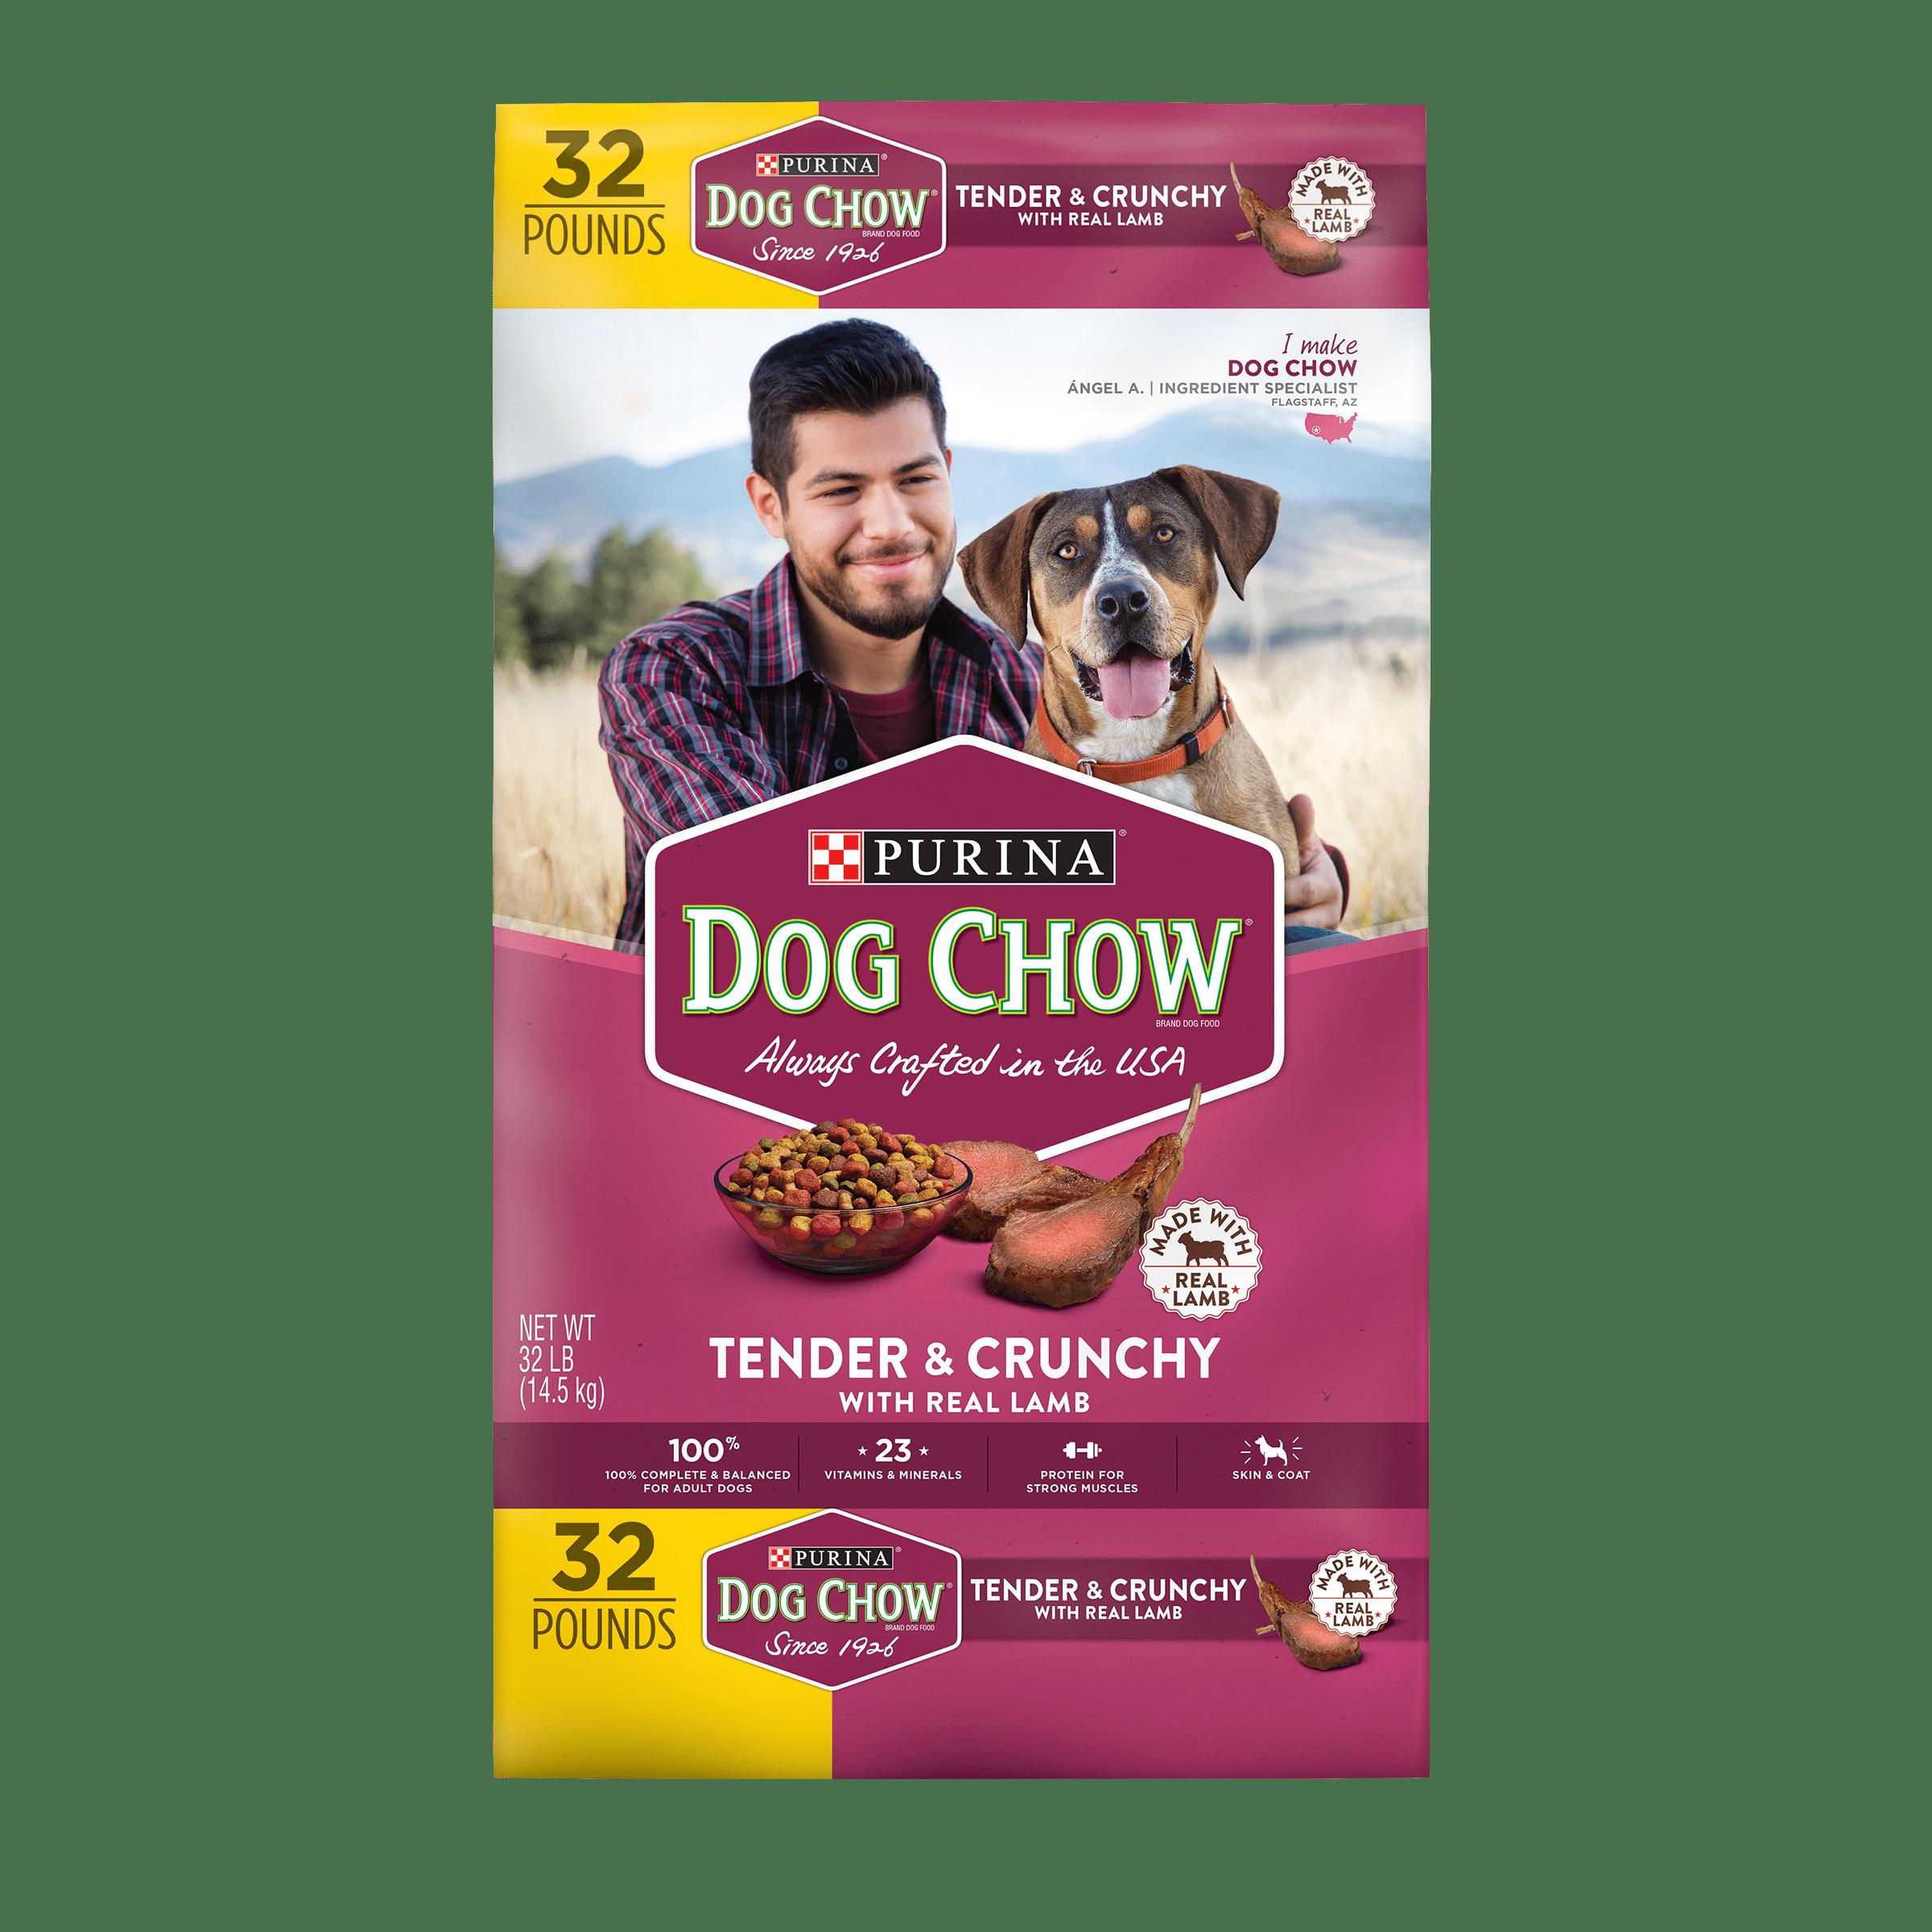 Purina Dog Chow Tender & Crunchy with Real Lamb Adult Dry Dog Food - 32 lb. Bag